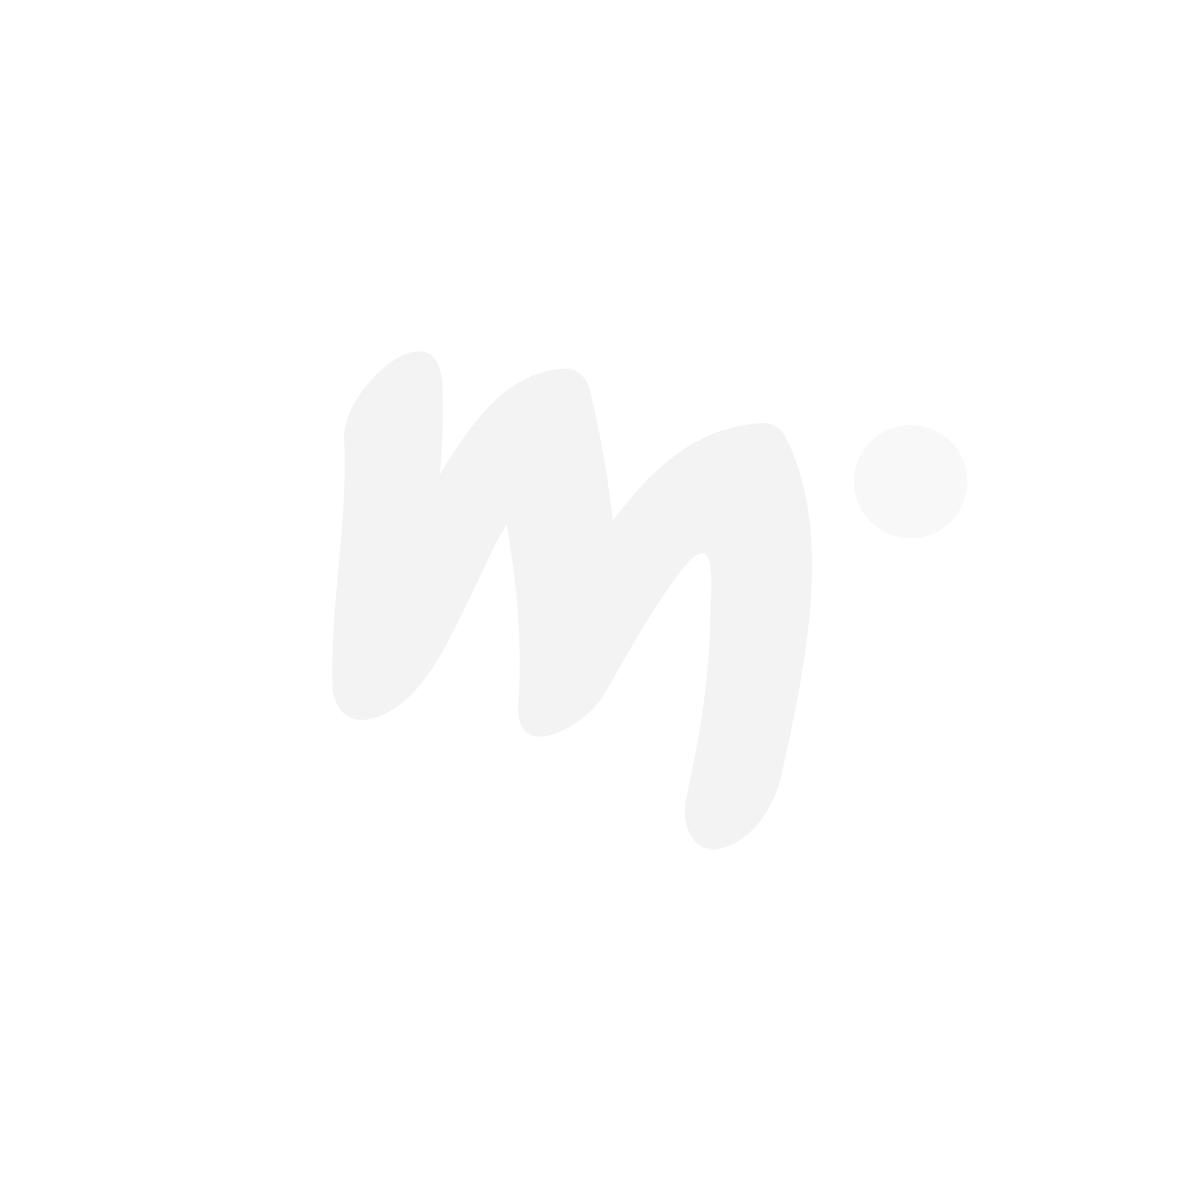 Mx Deco Koristetonttu valkoinen 10 cm